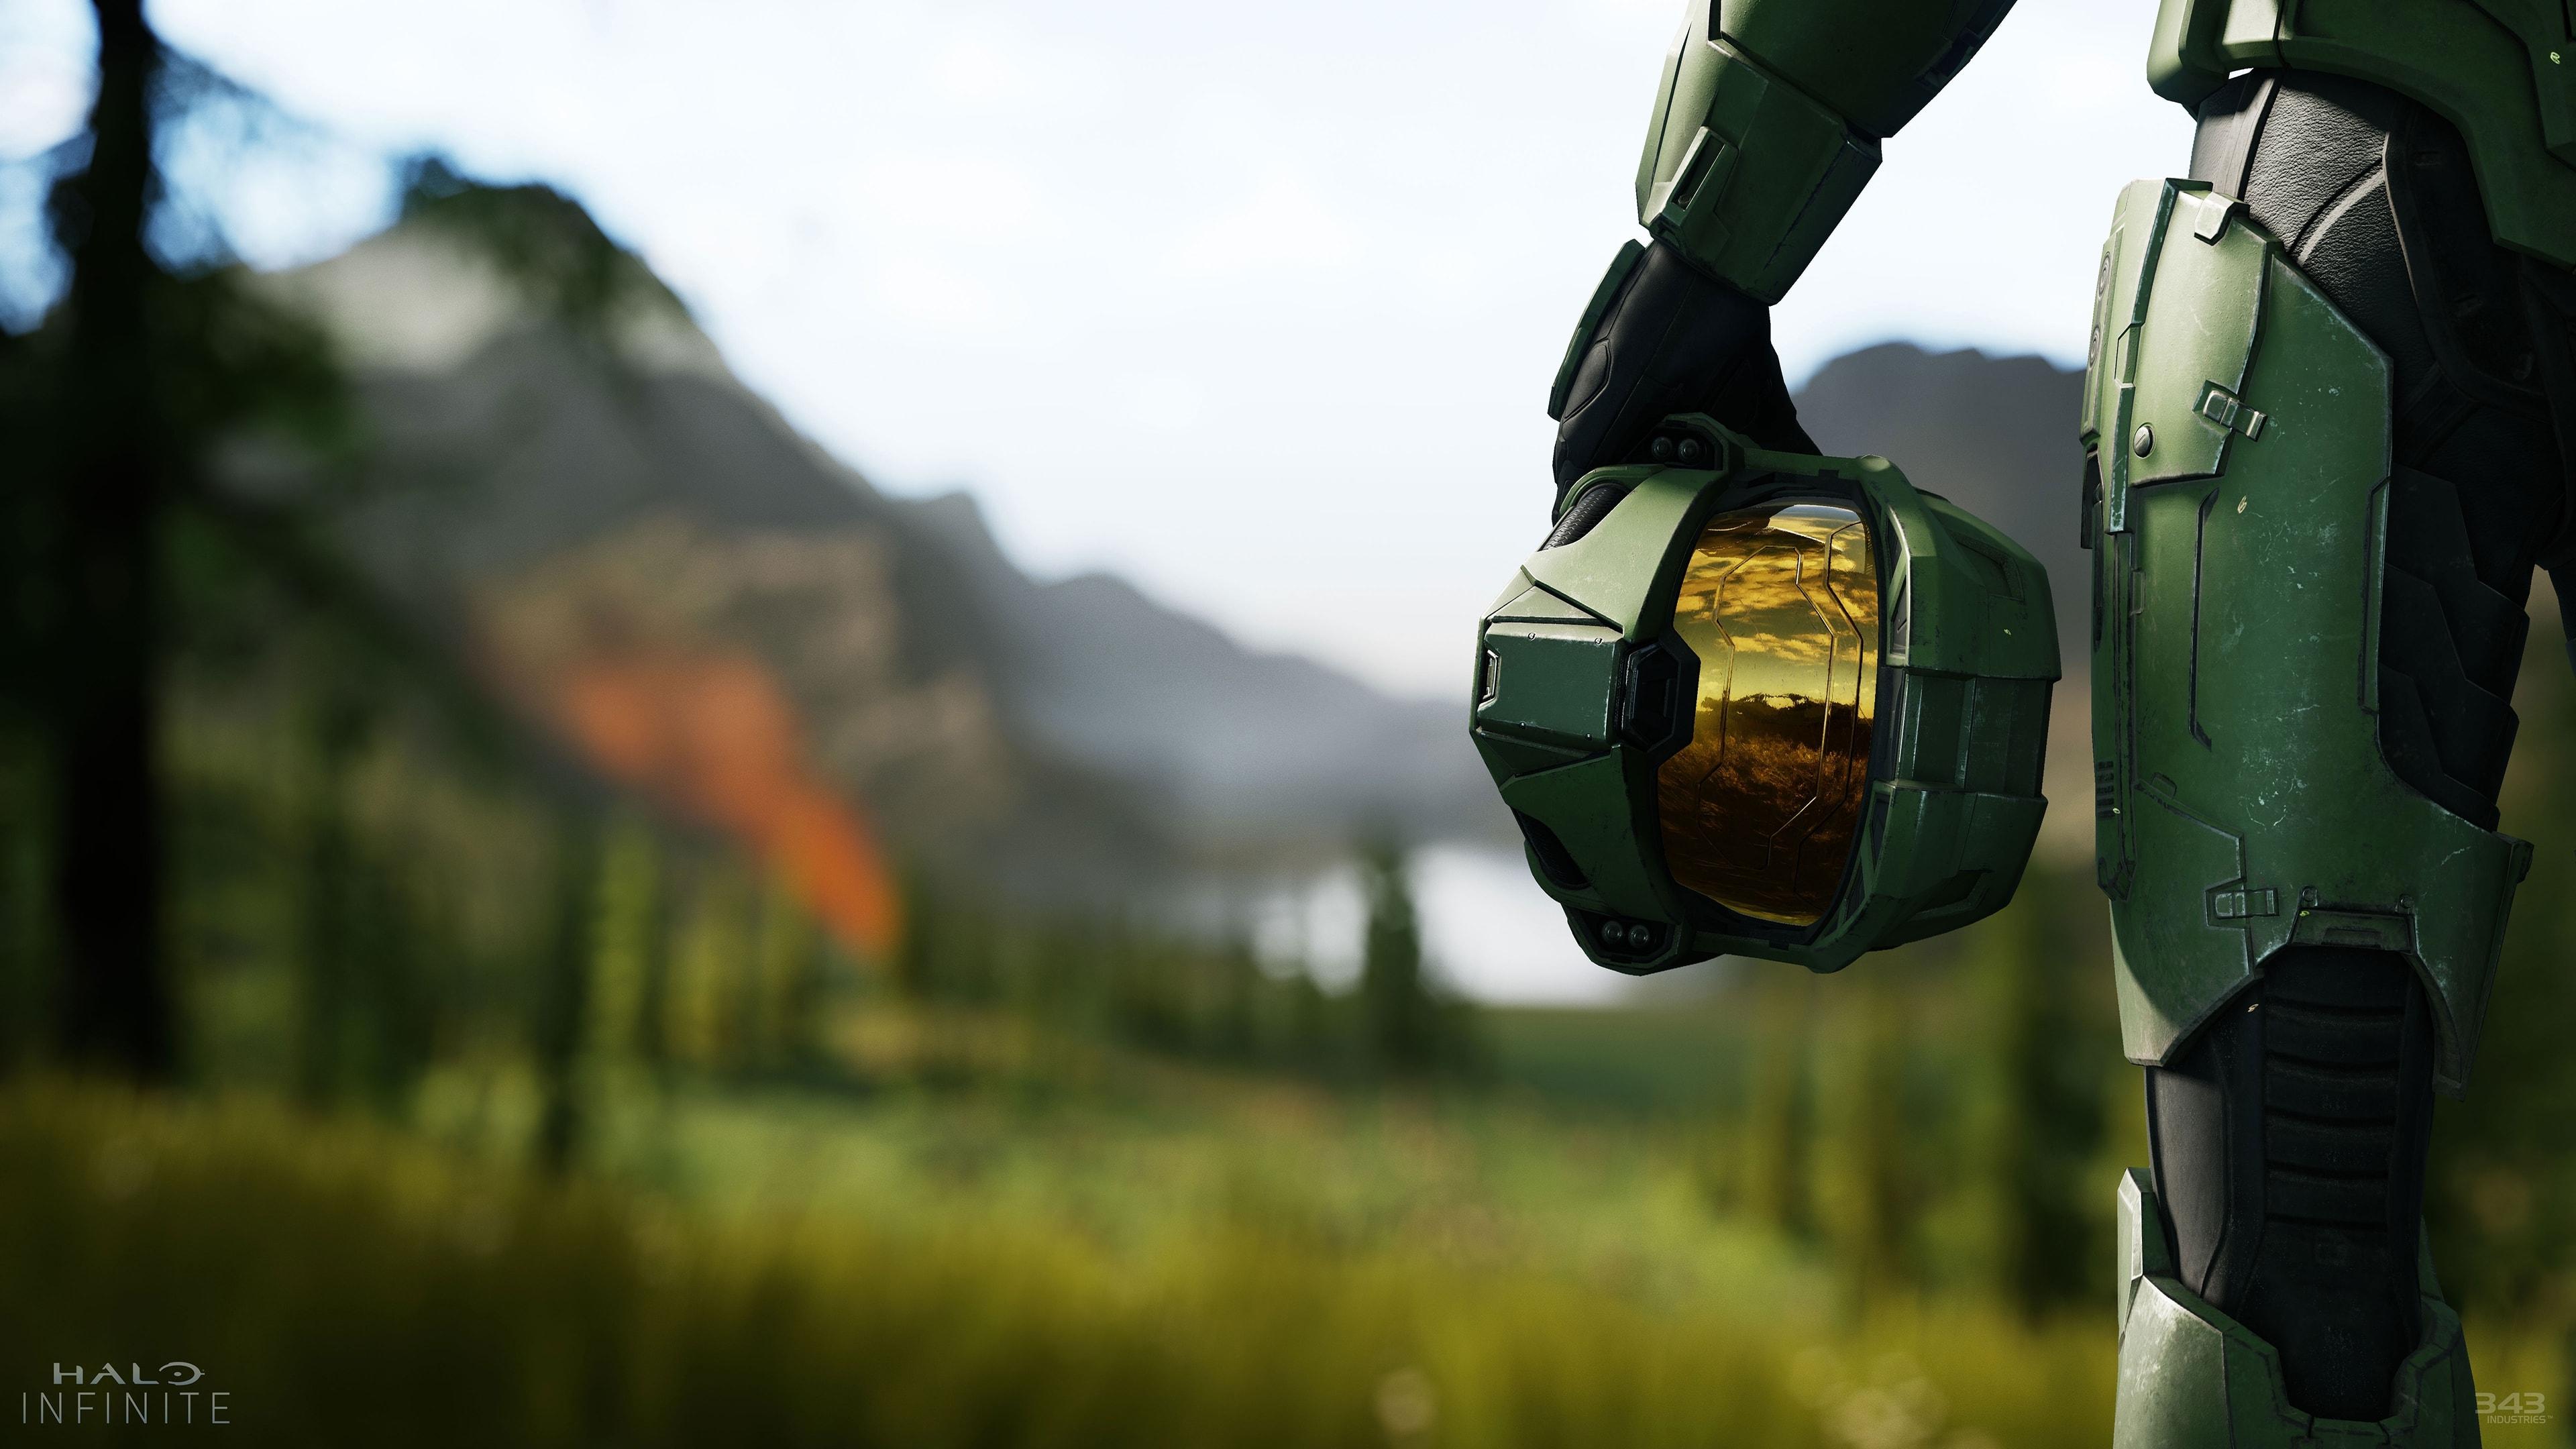 Halo-Infinite-Screen-2.jpg